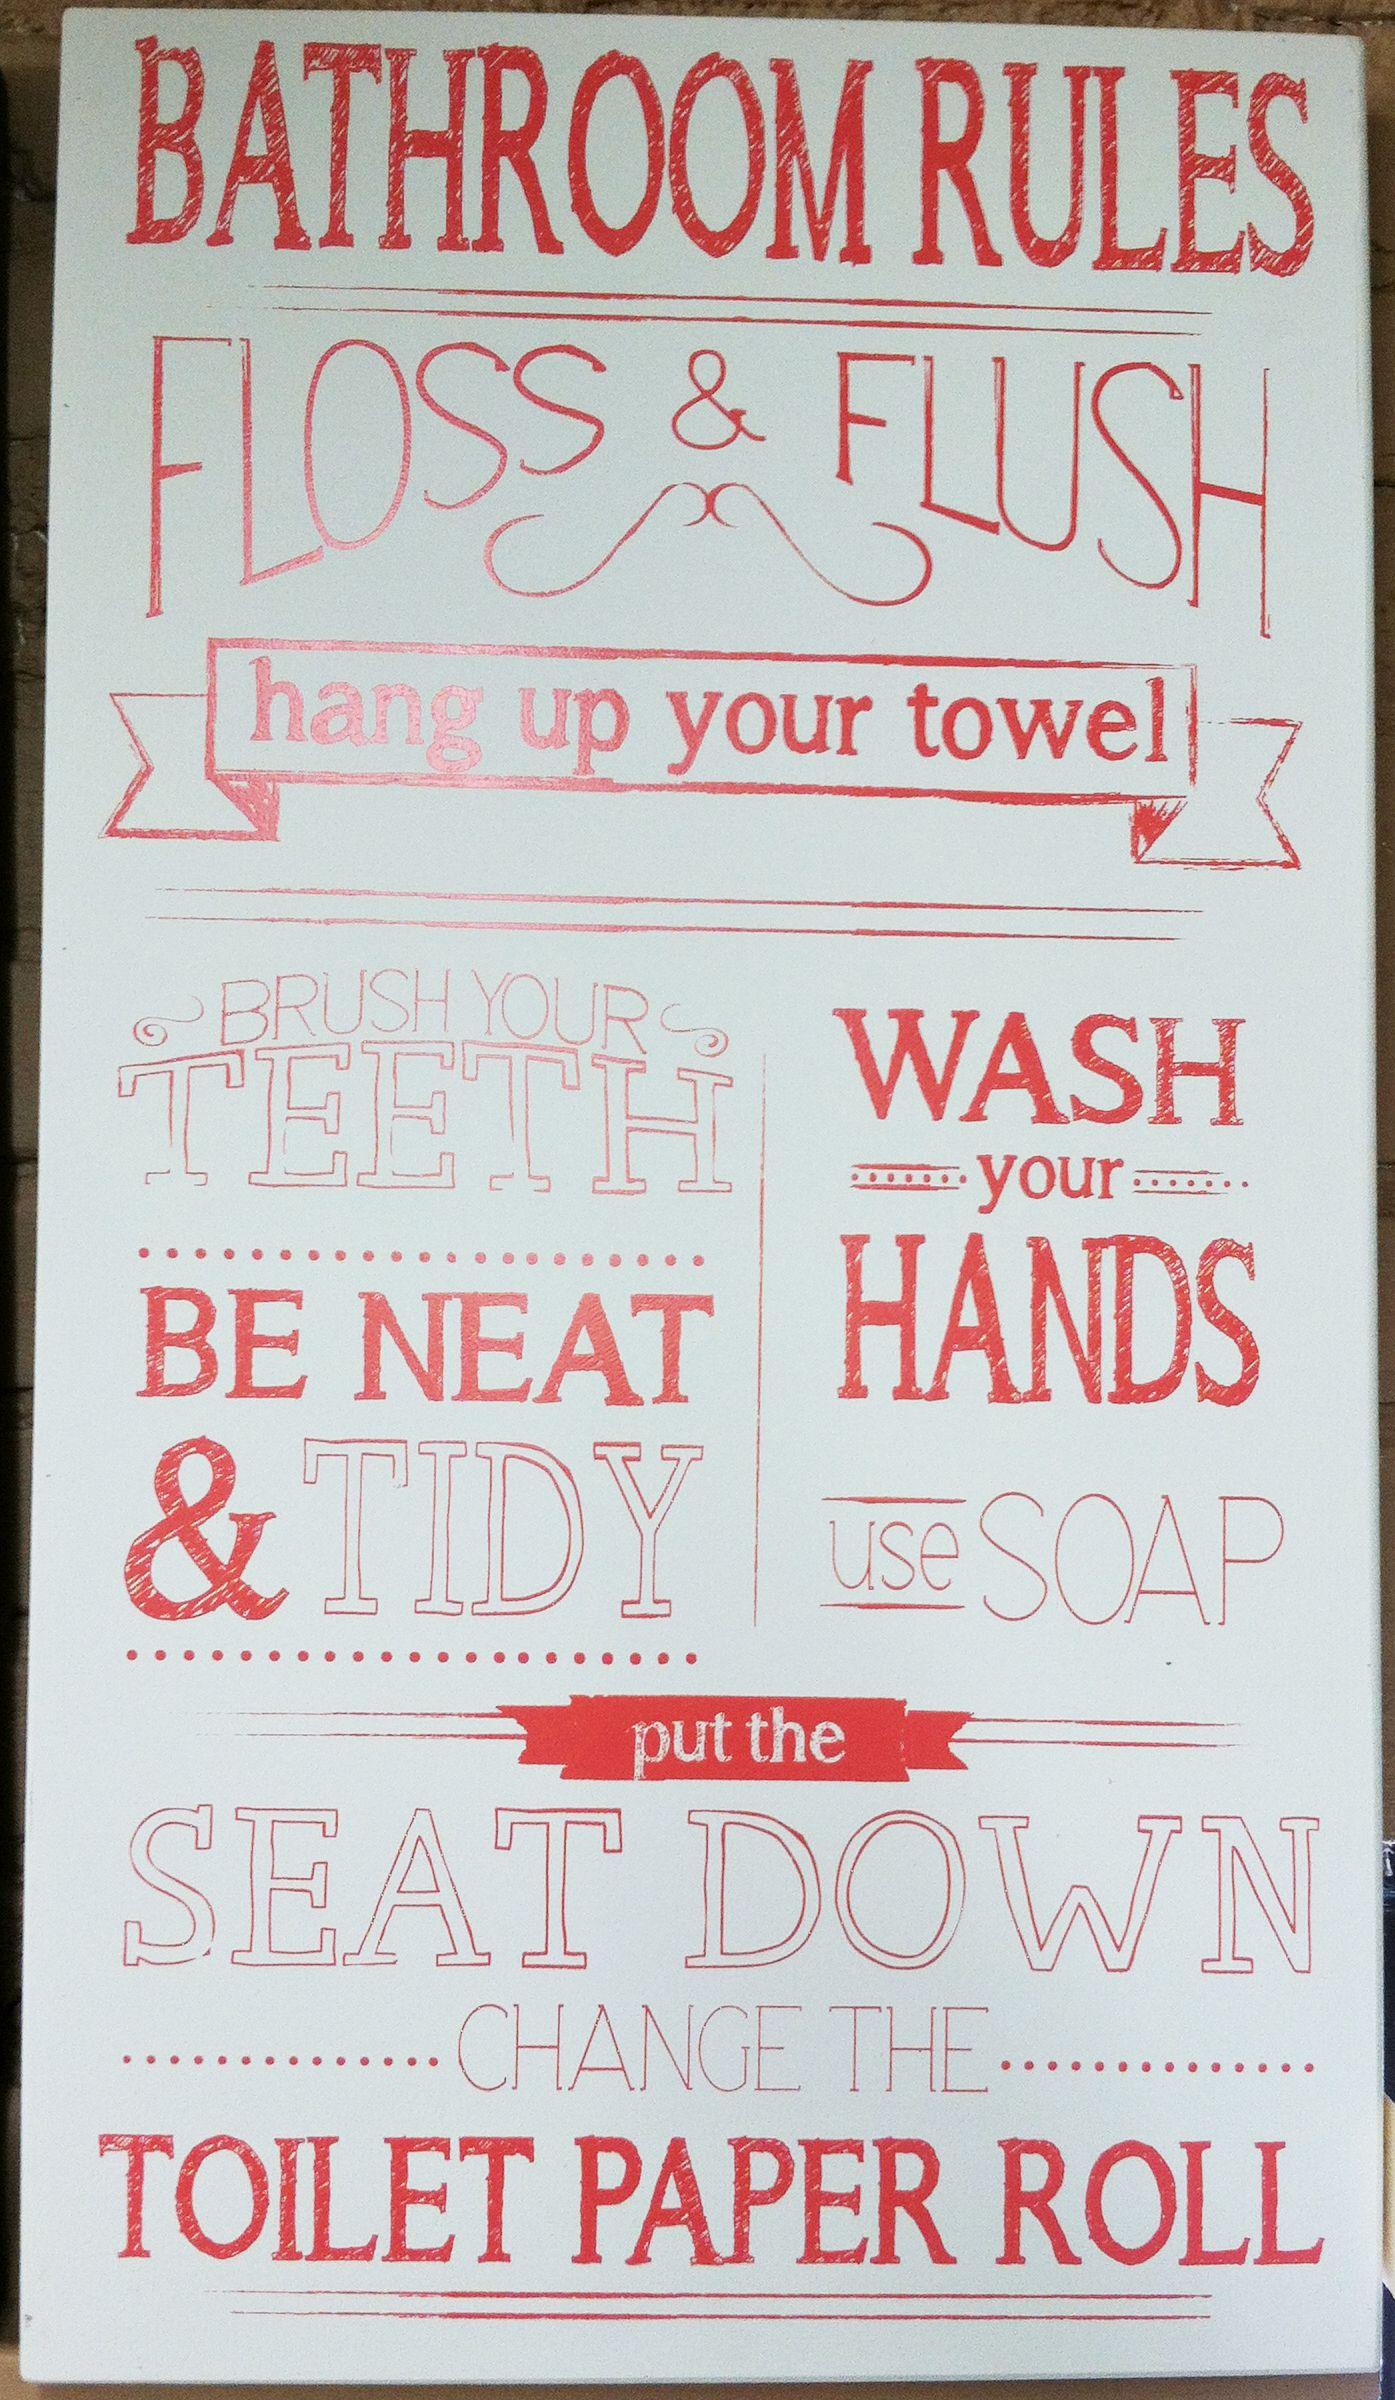 bathroom rules floss flush hang up your towel brush your teeth